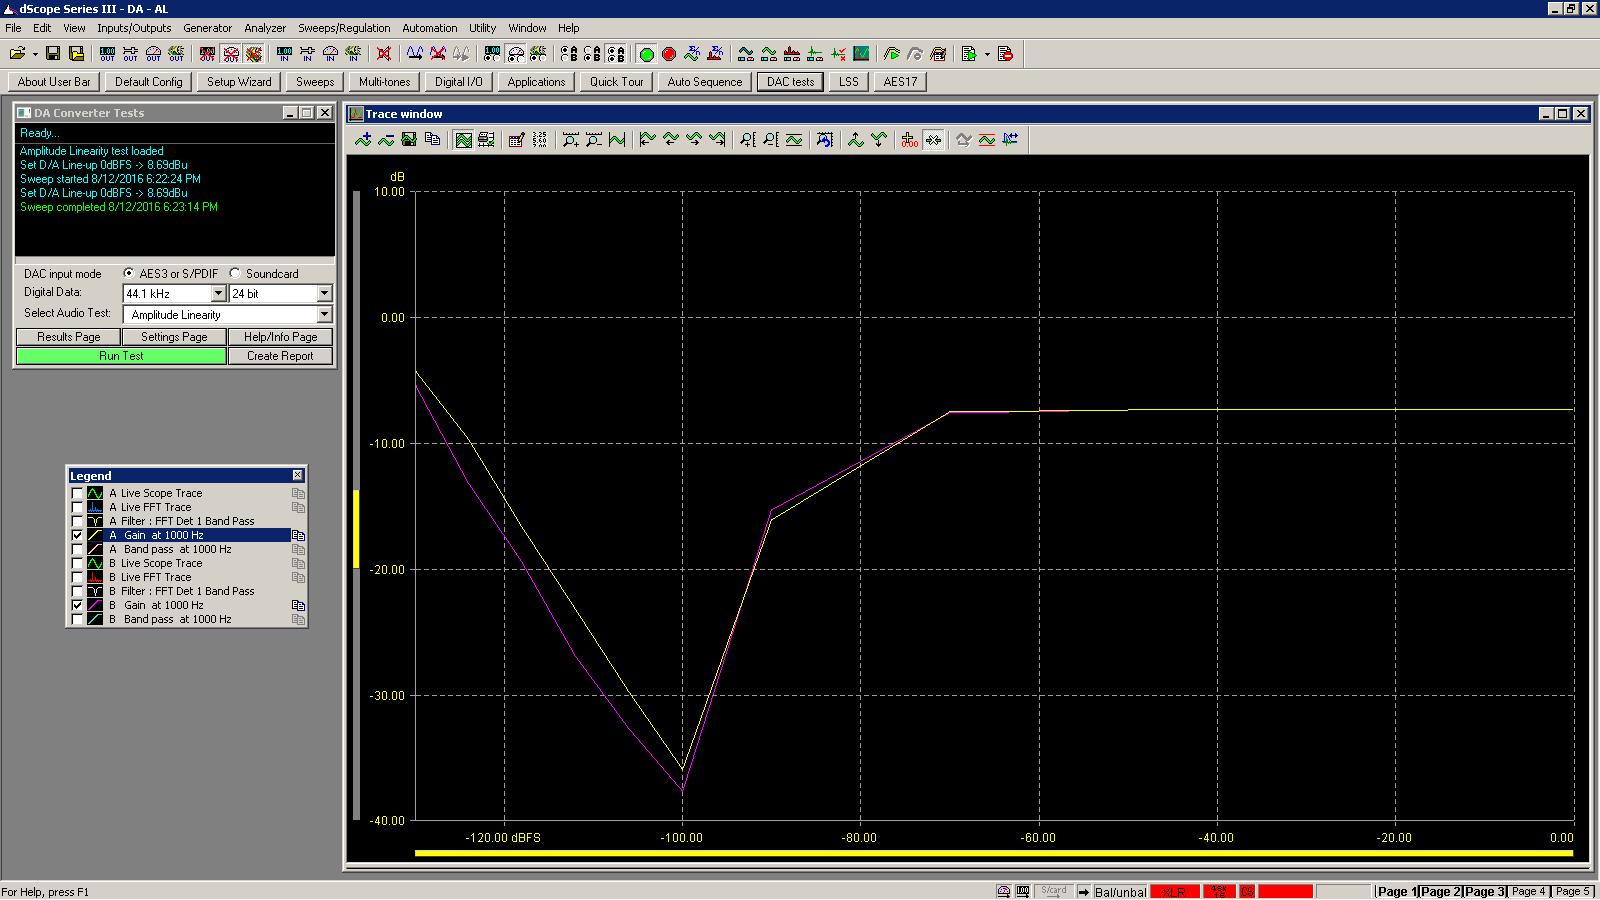 20160812 Modi MB SE 1KHz gain linearity - toslink.png